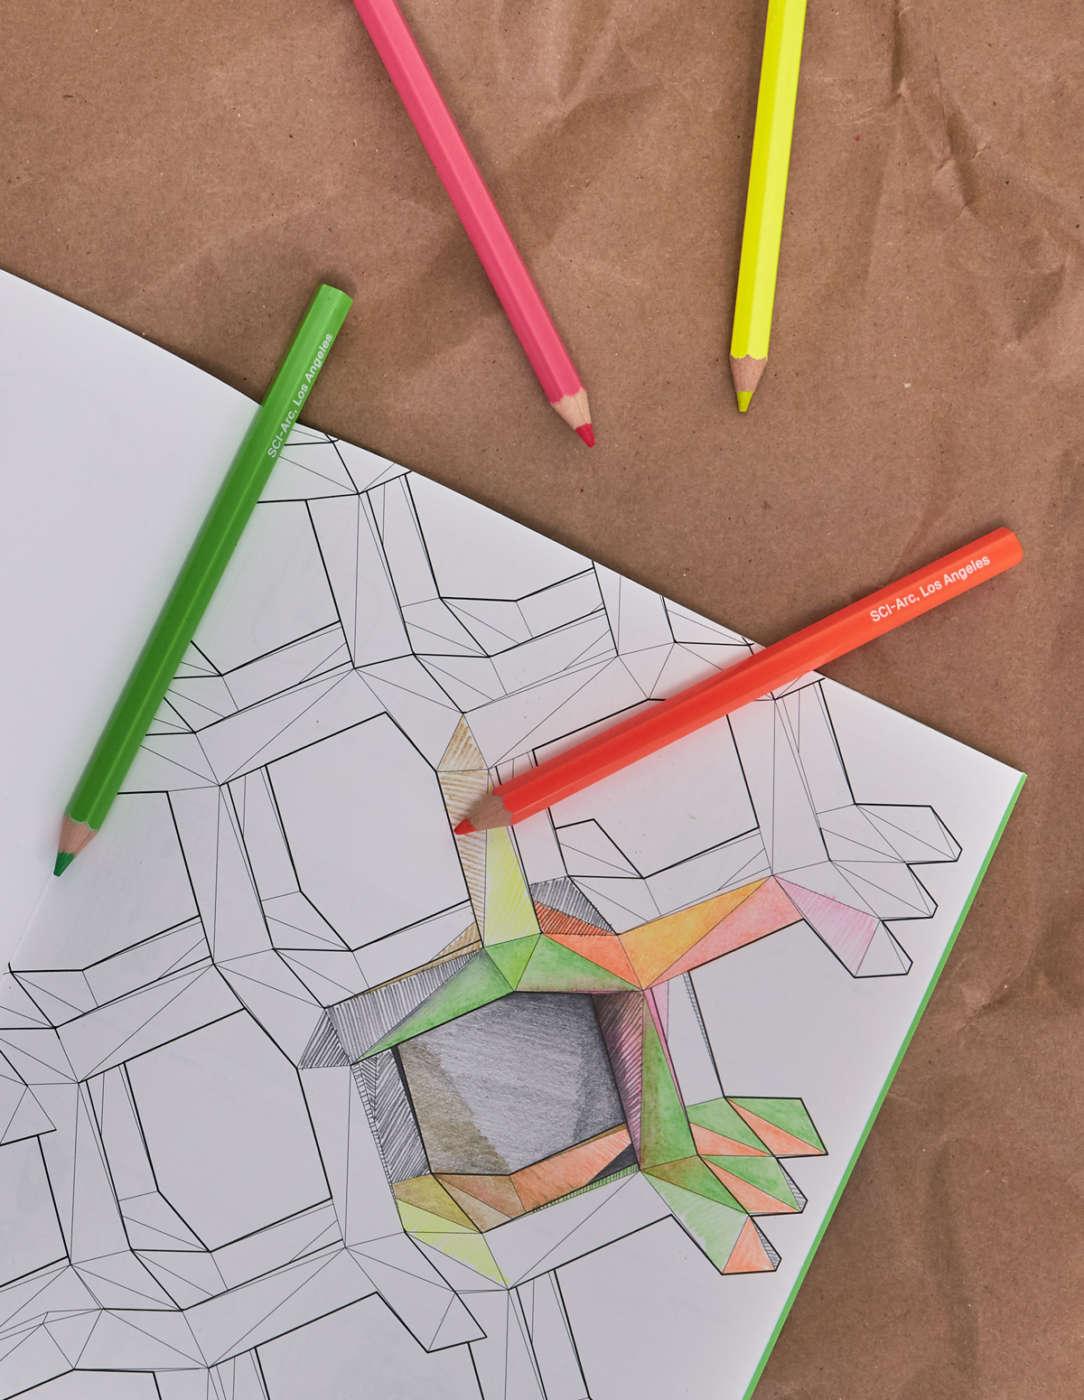 Neon Pencils3